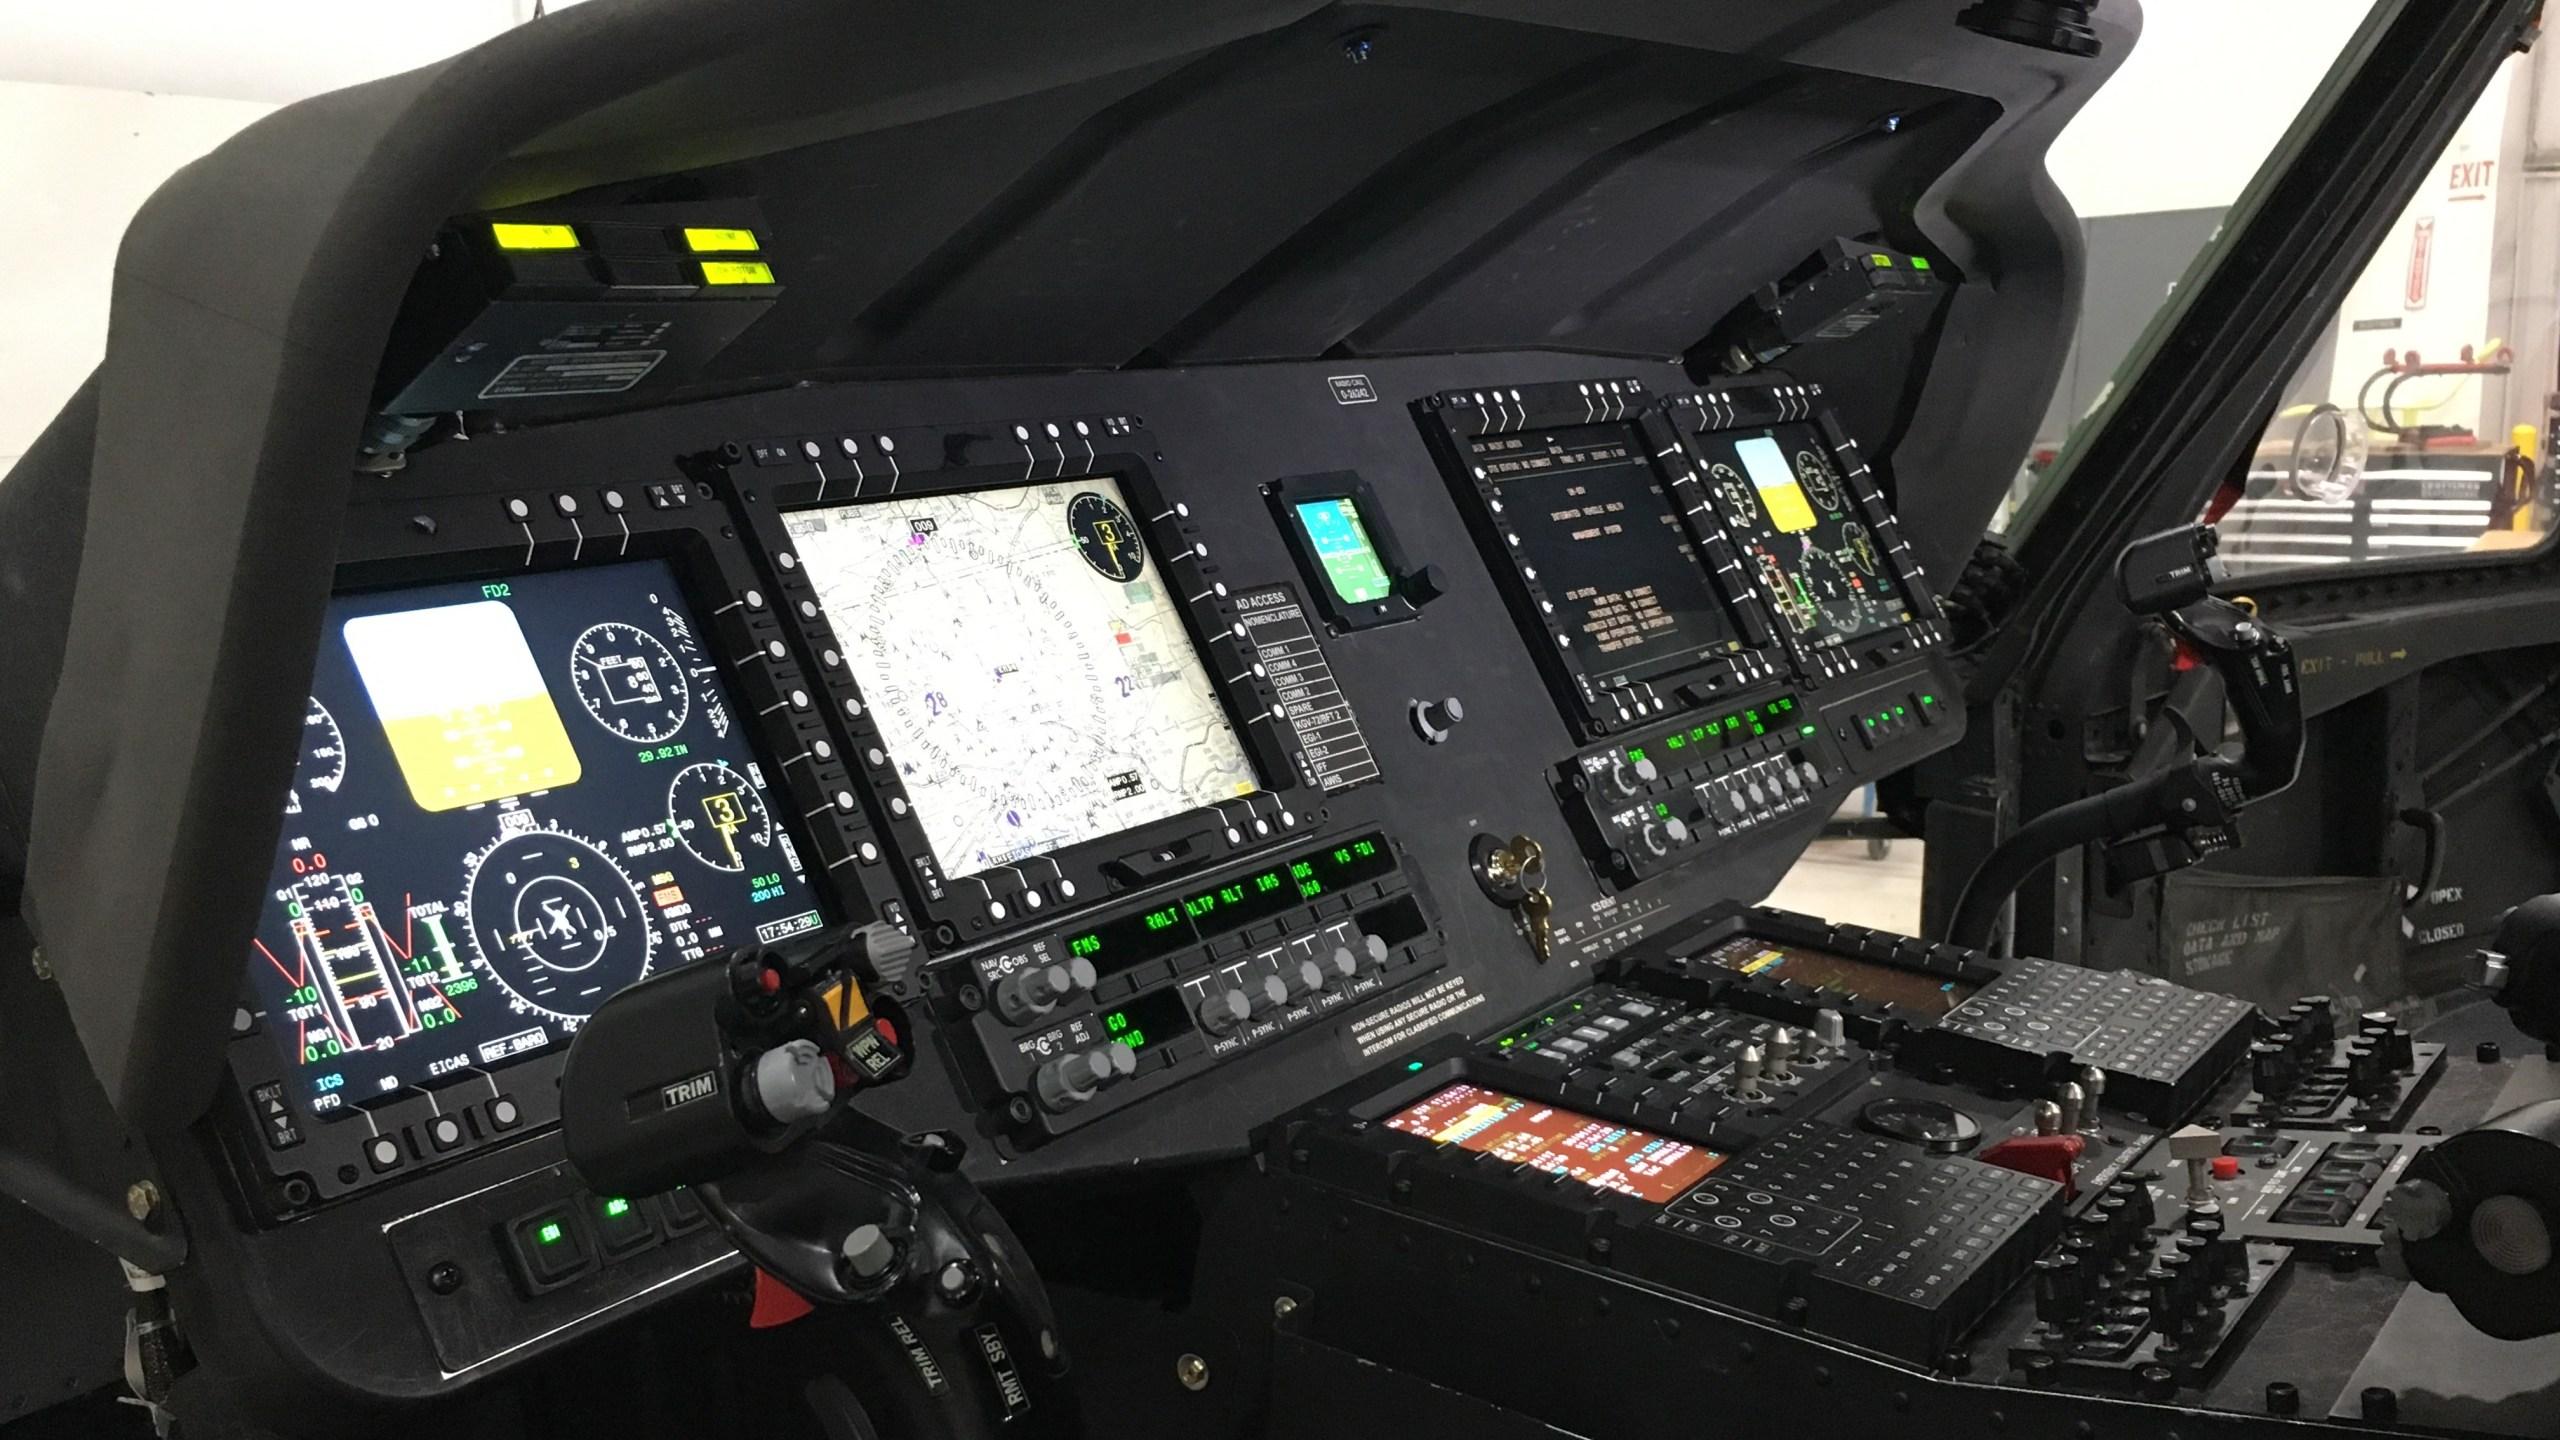 Digital UH-60 Victor cockpit